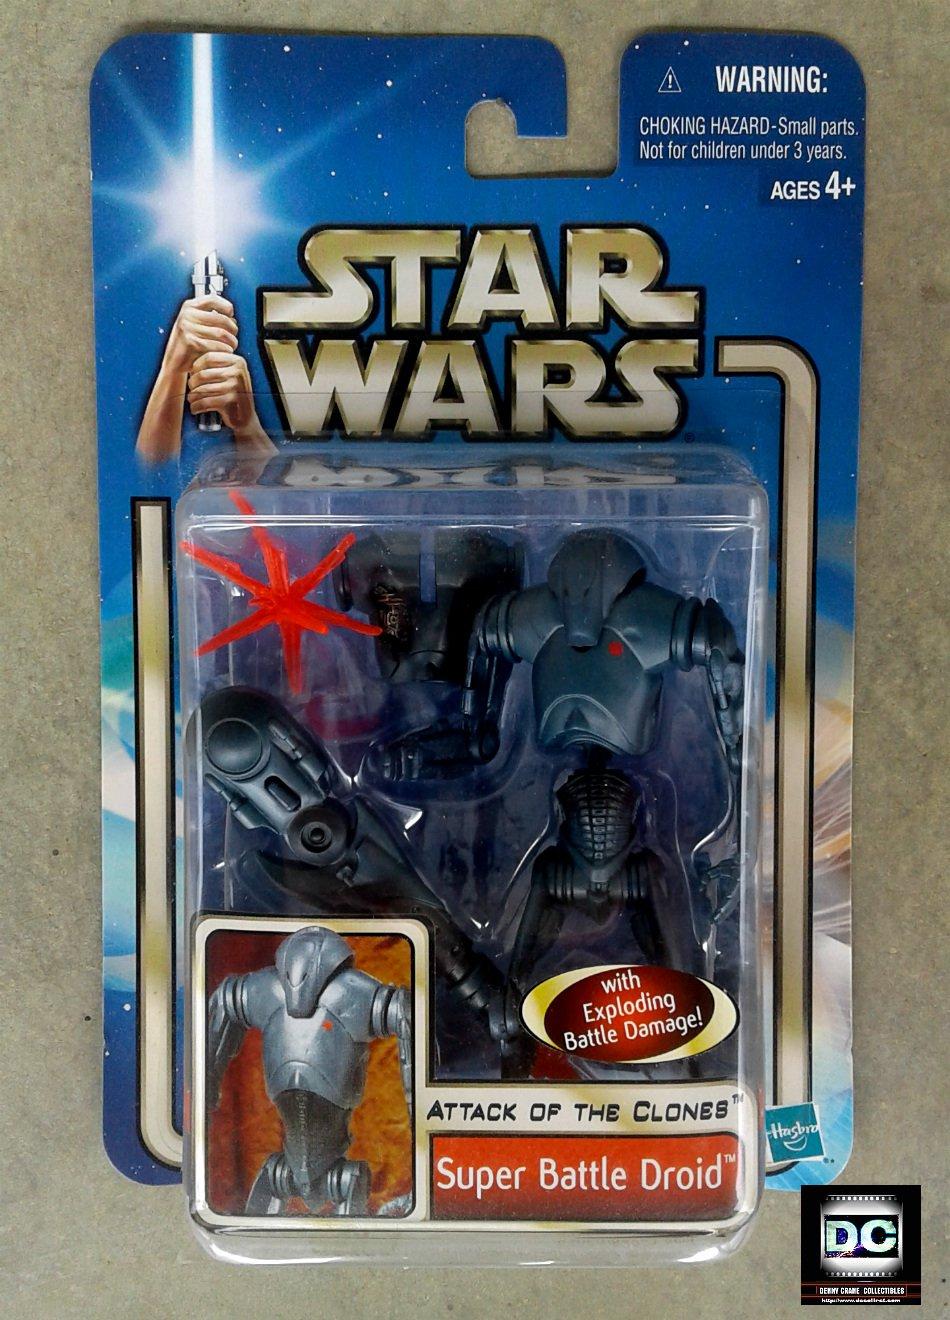 Hasbro Star Wars #84853: Super Battle Droid [1st Day Variant] -- AotC Saga 2002, Clone Separatist